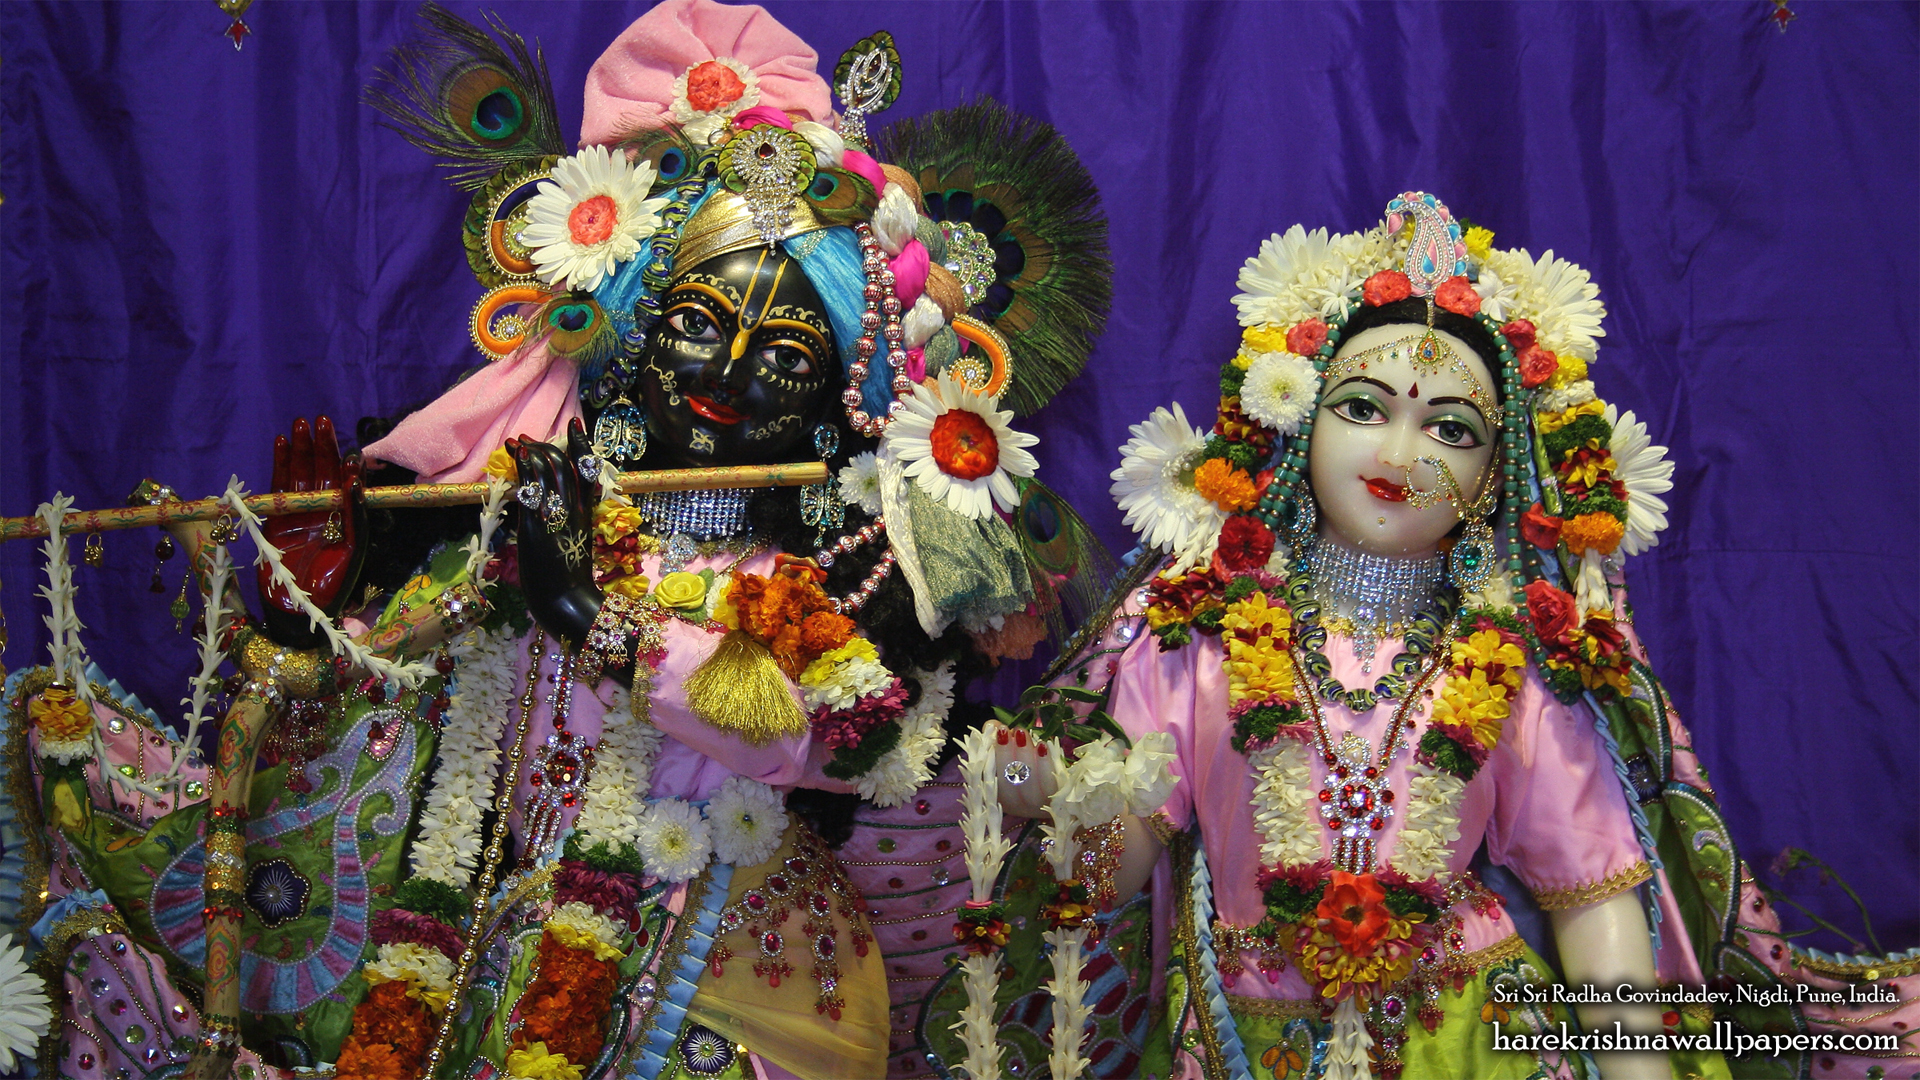 Sri Sri Radha Govind Close up Wallpaper (012) Size 1920x1080 Download